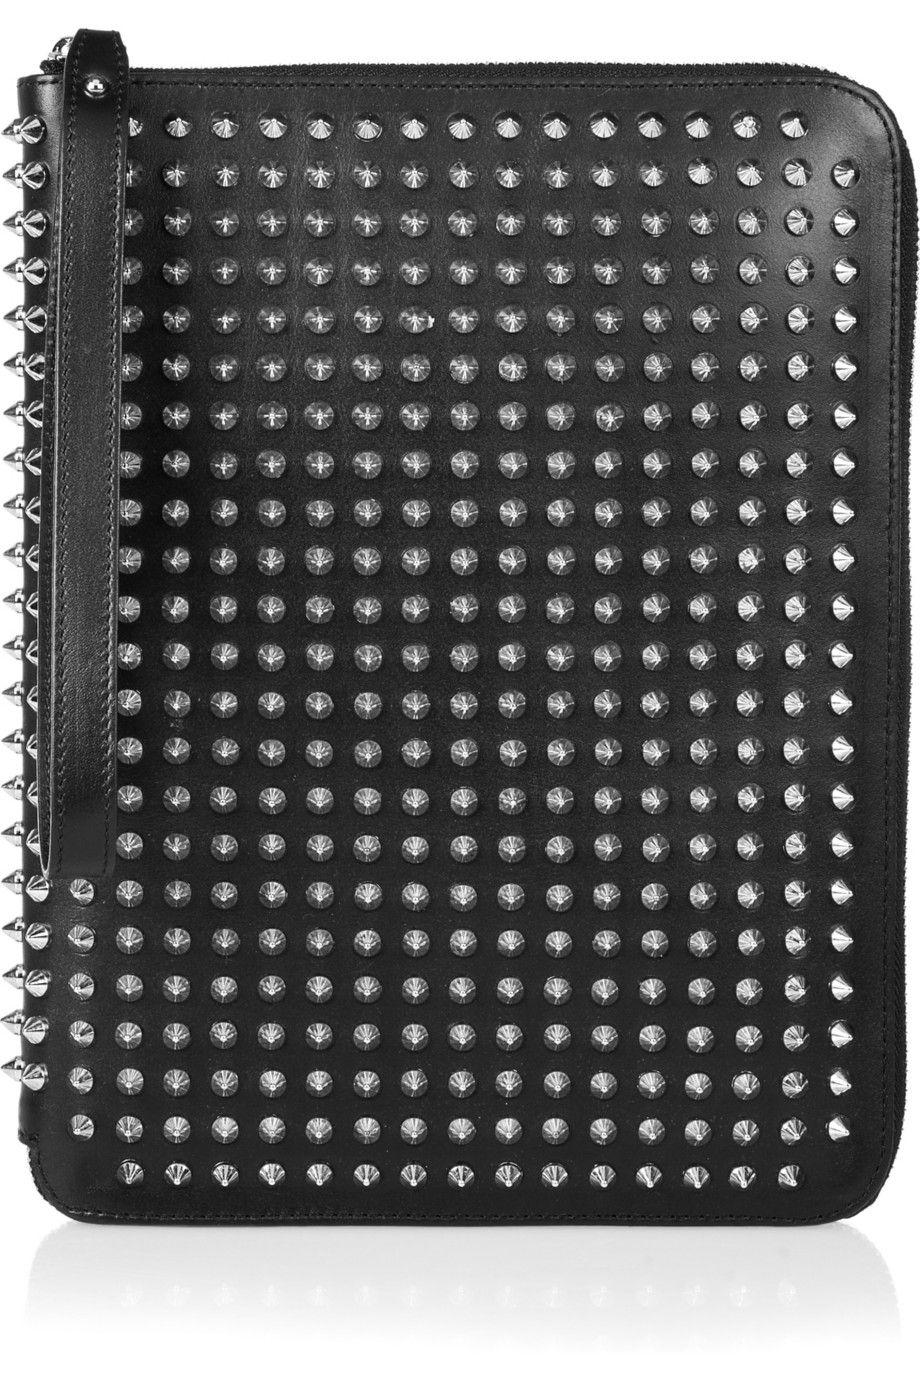 c75f2e1bd5f Christian Louboutin | Studded leather iPad case | NET-A-PORTER.COM ...